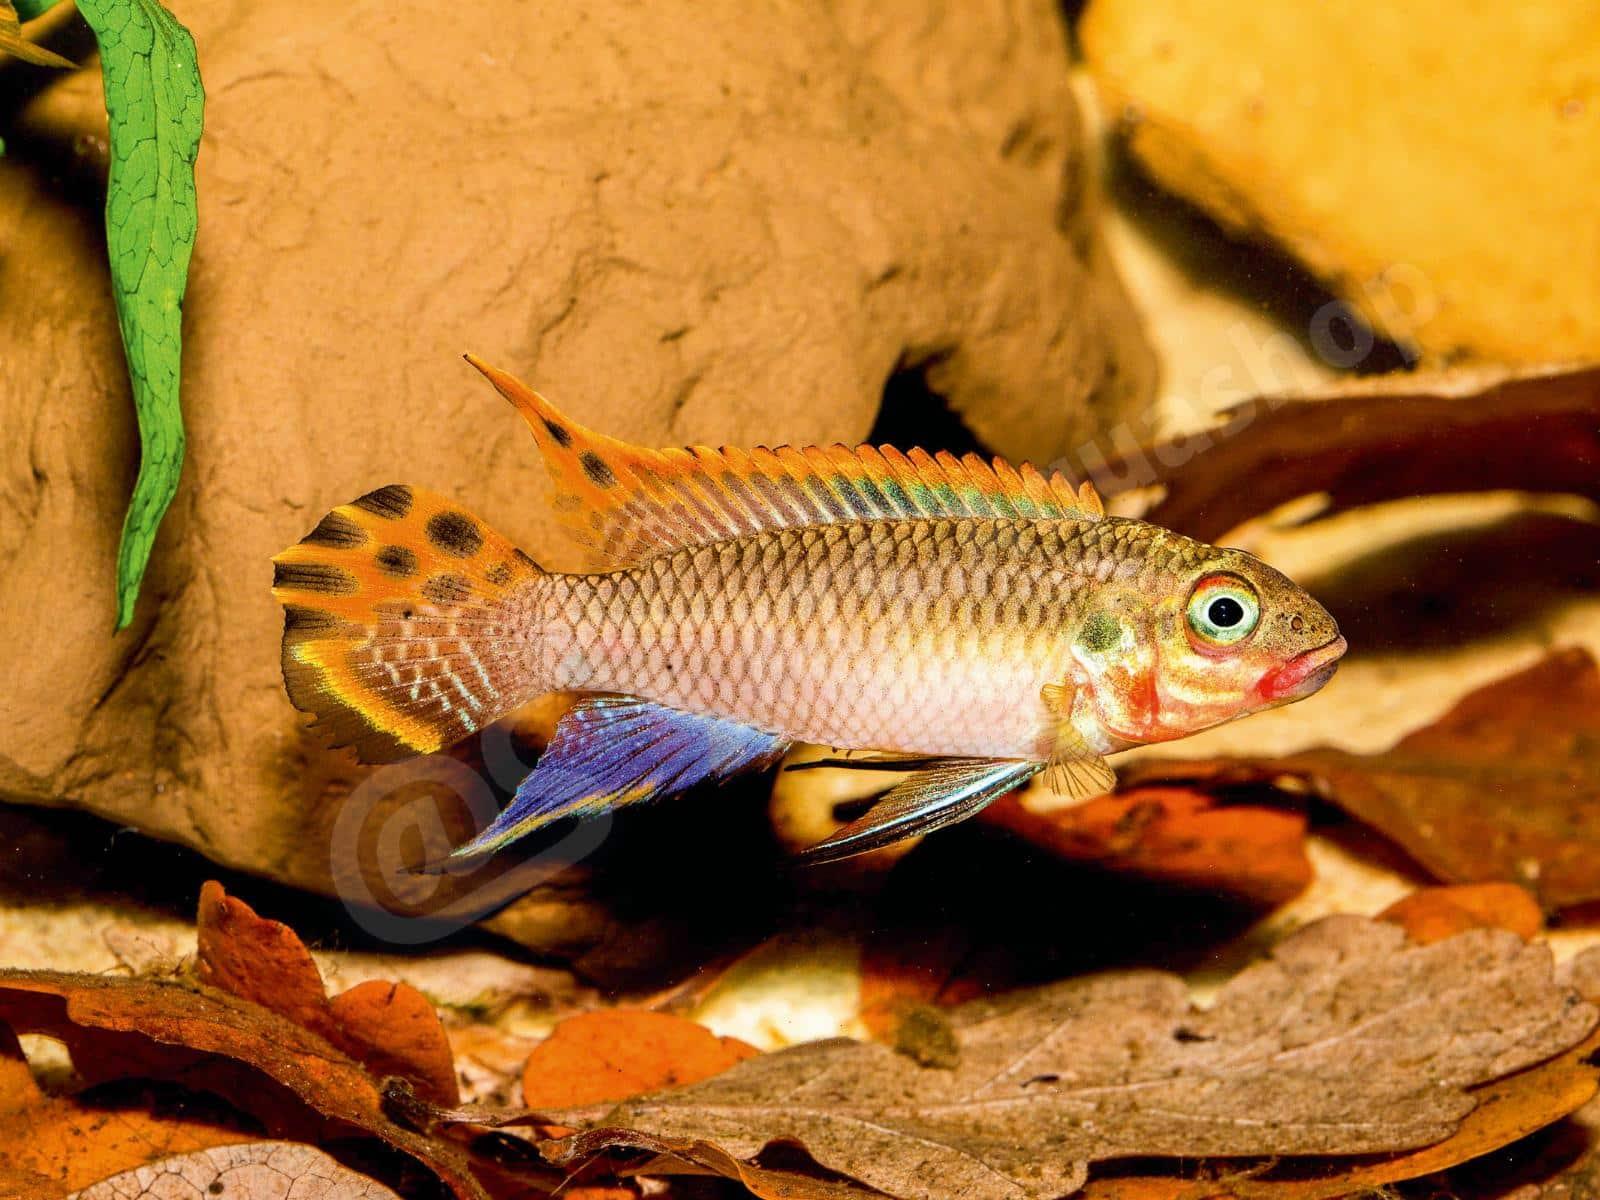 pelvicachromis taeniatus nigeria red andreas tanke 0043 8